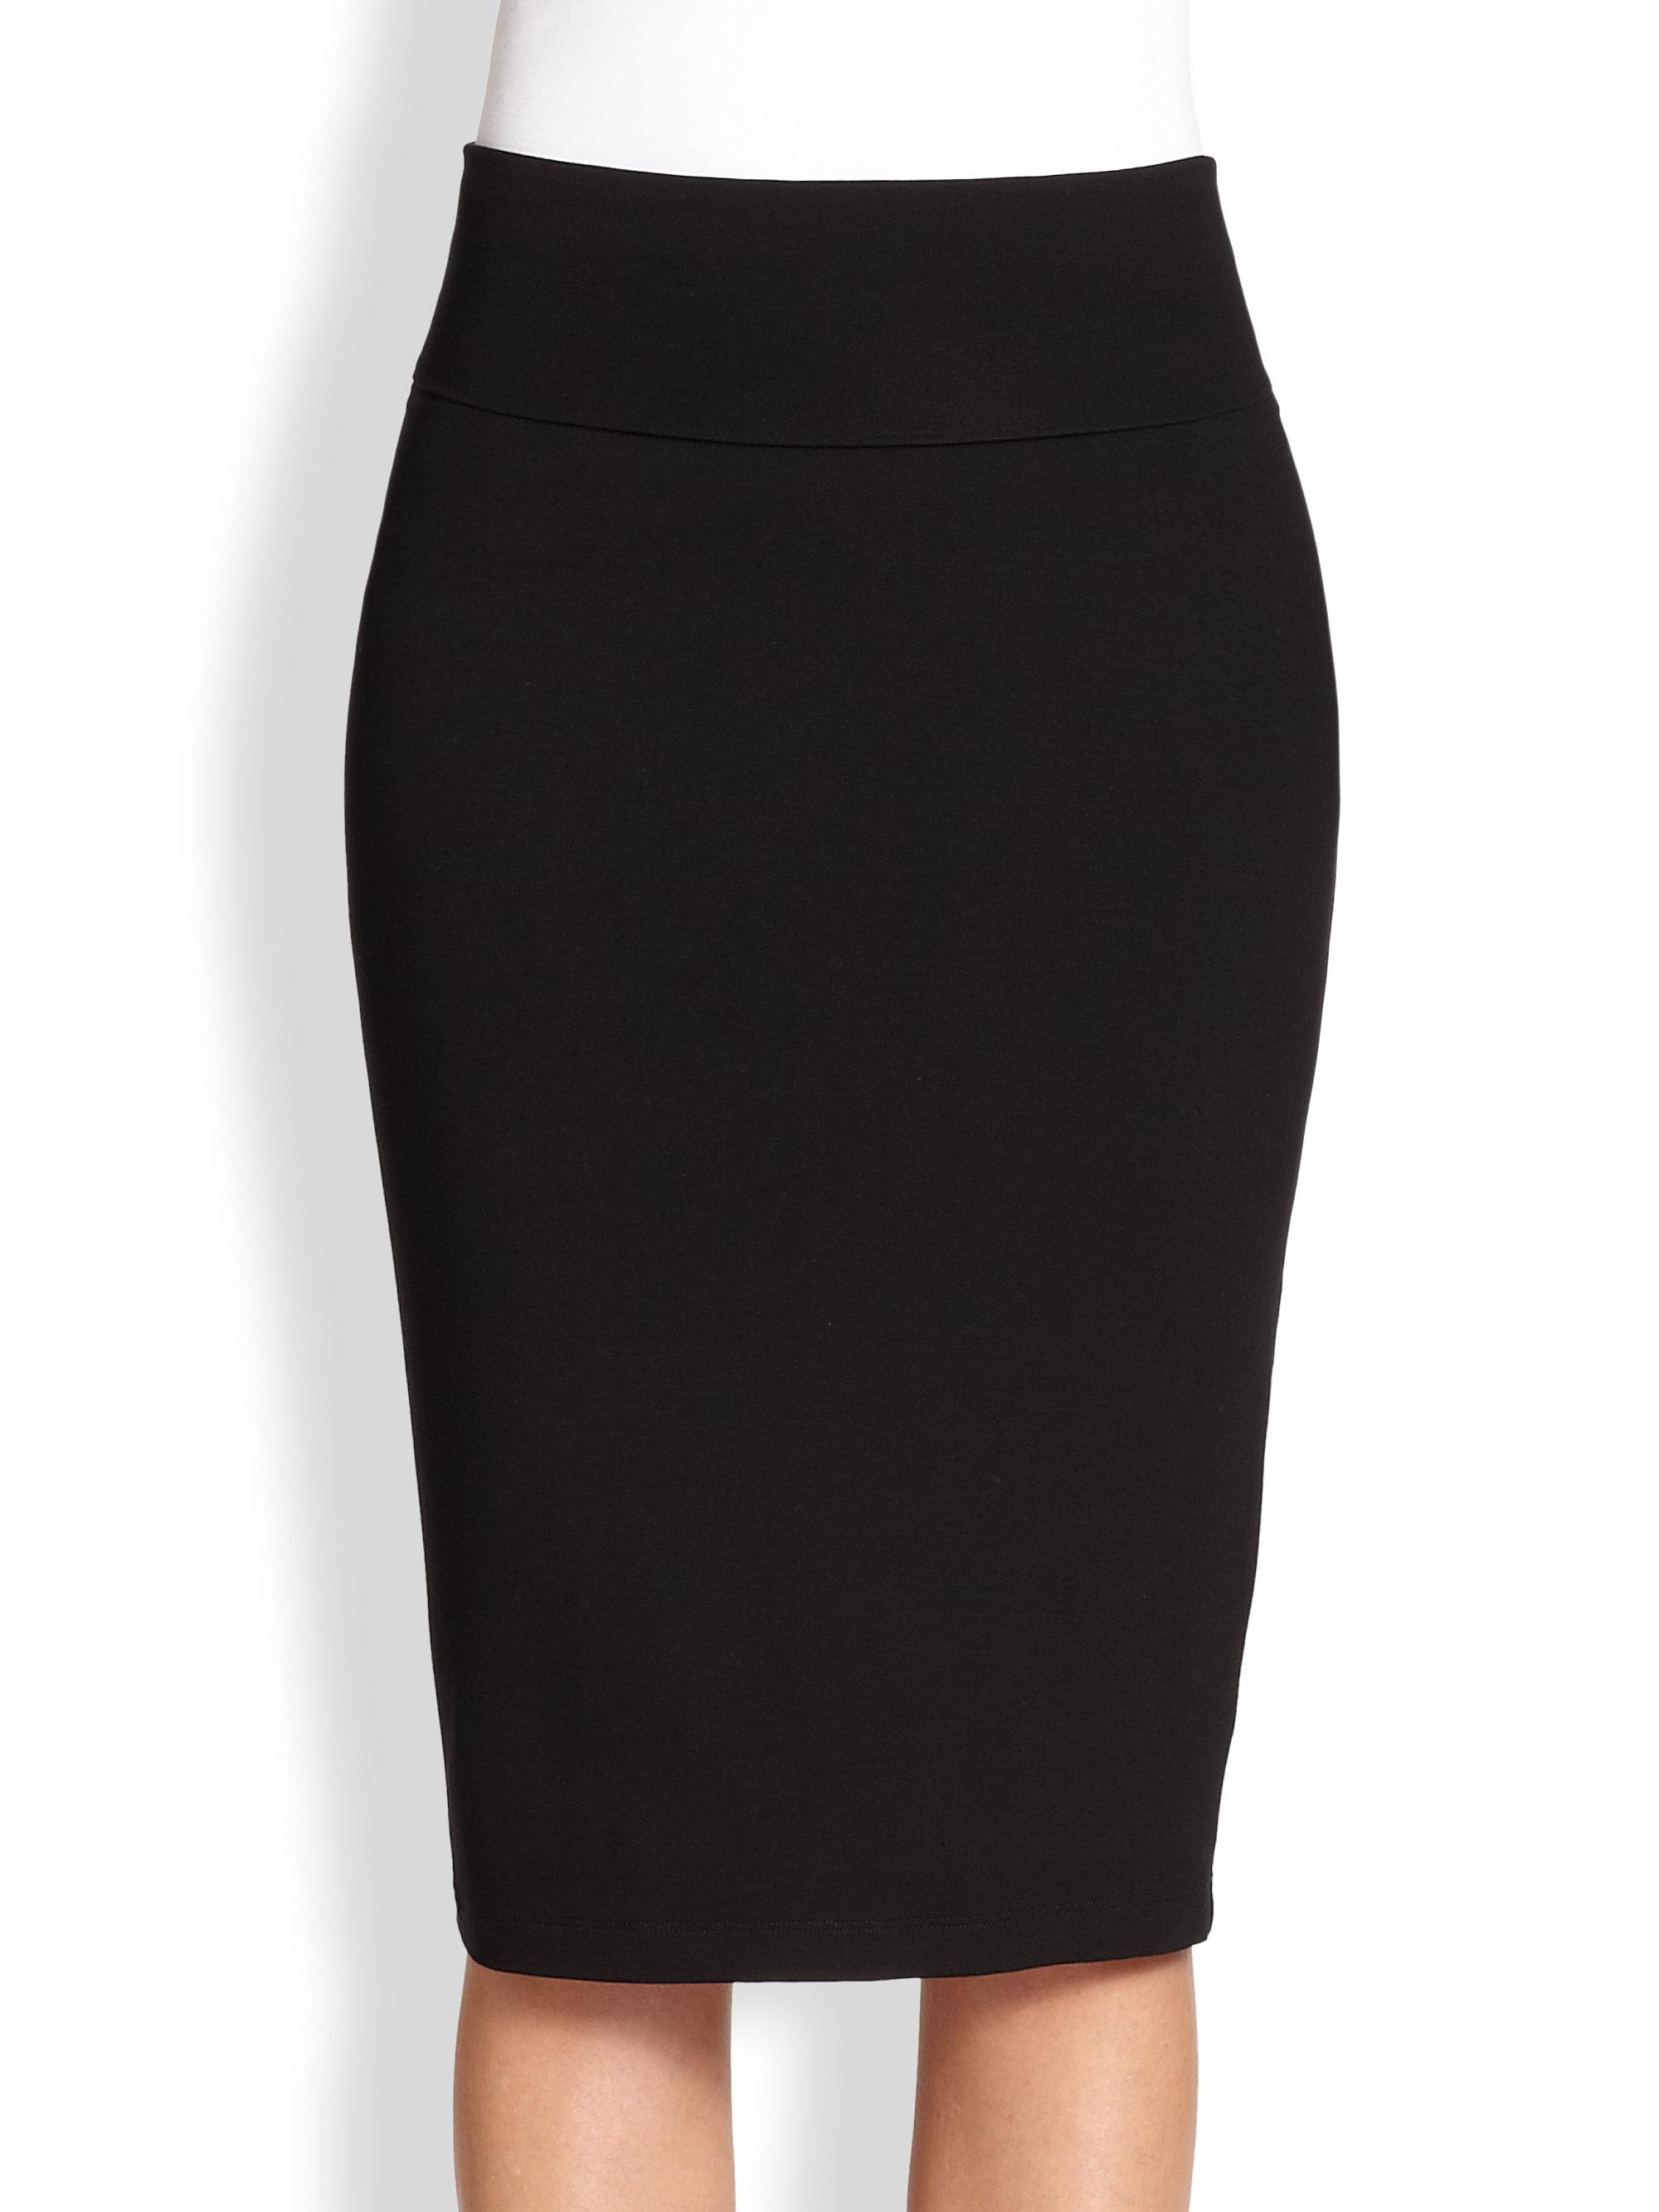 Eileen Fisher Knit Pencil Skirt in Black | Lyst